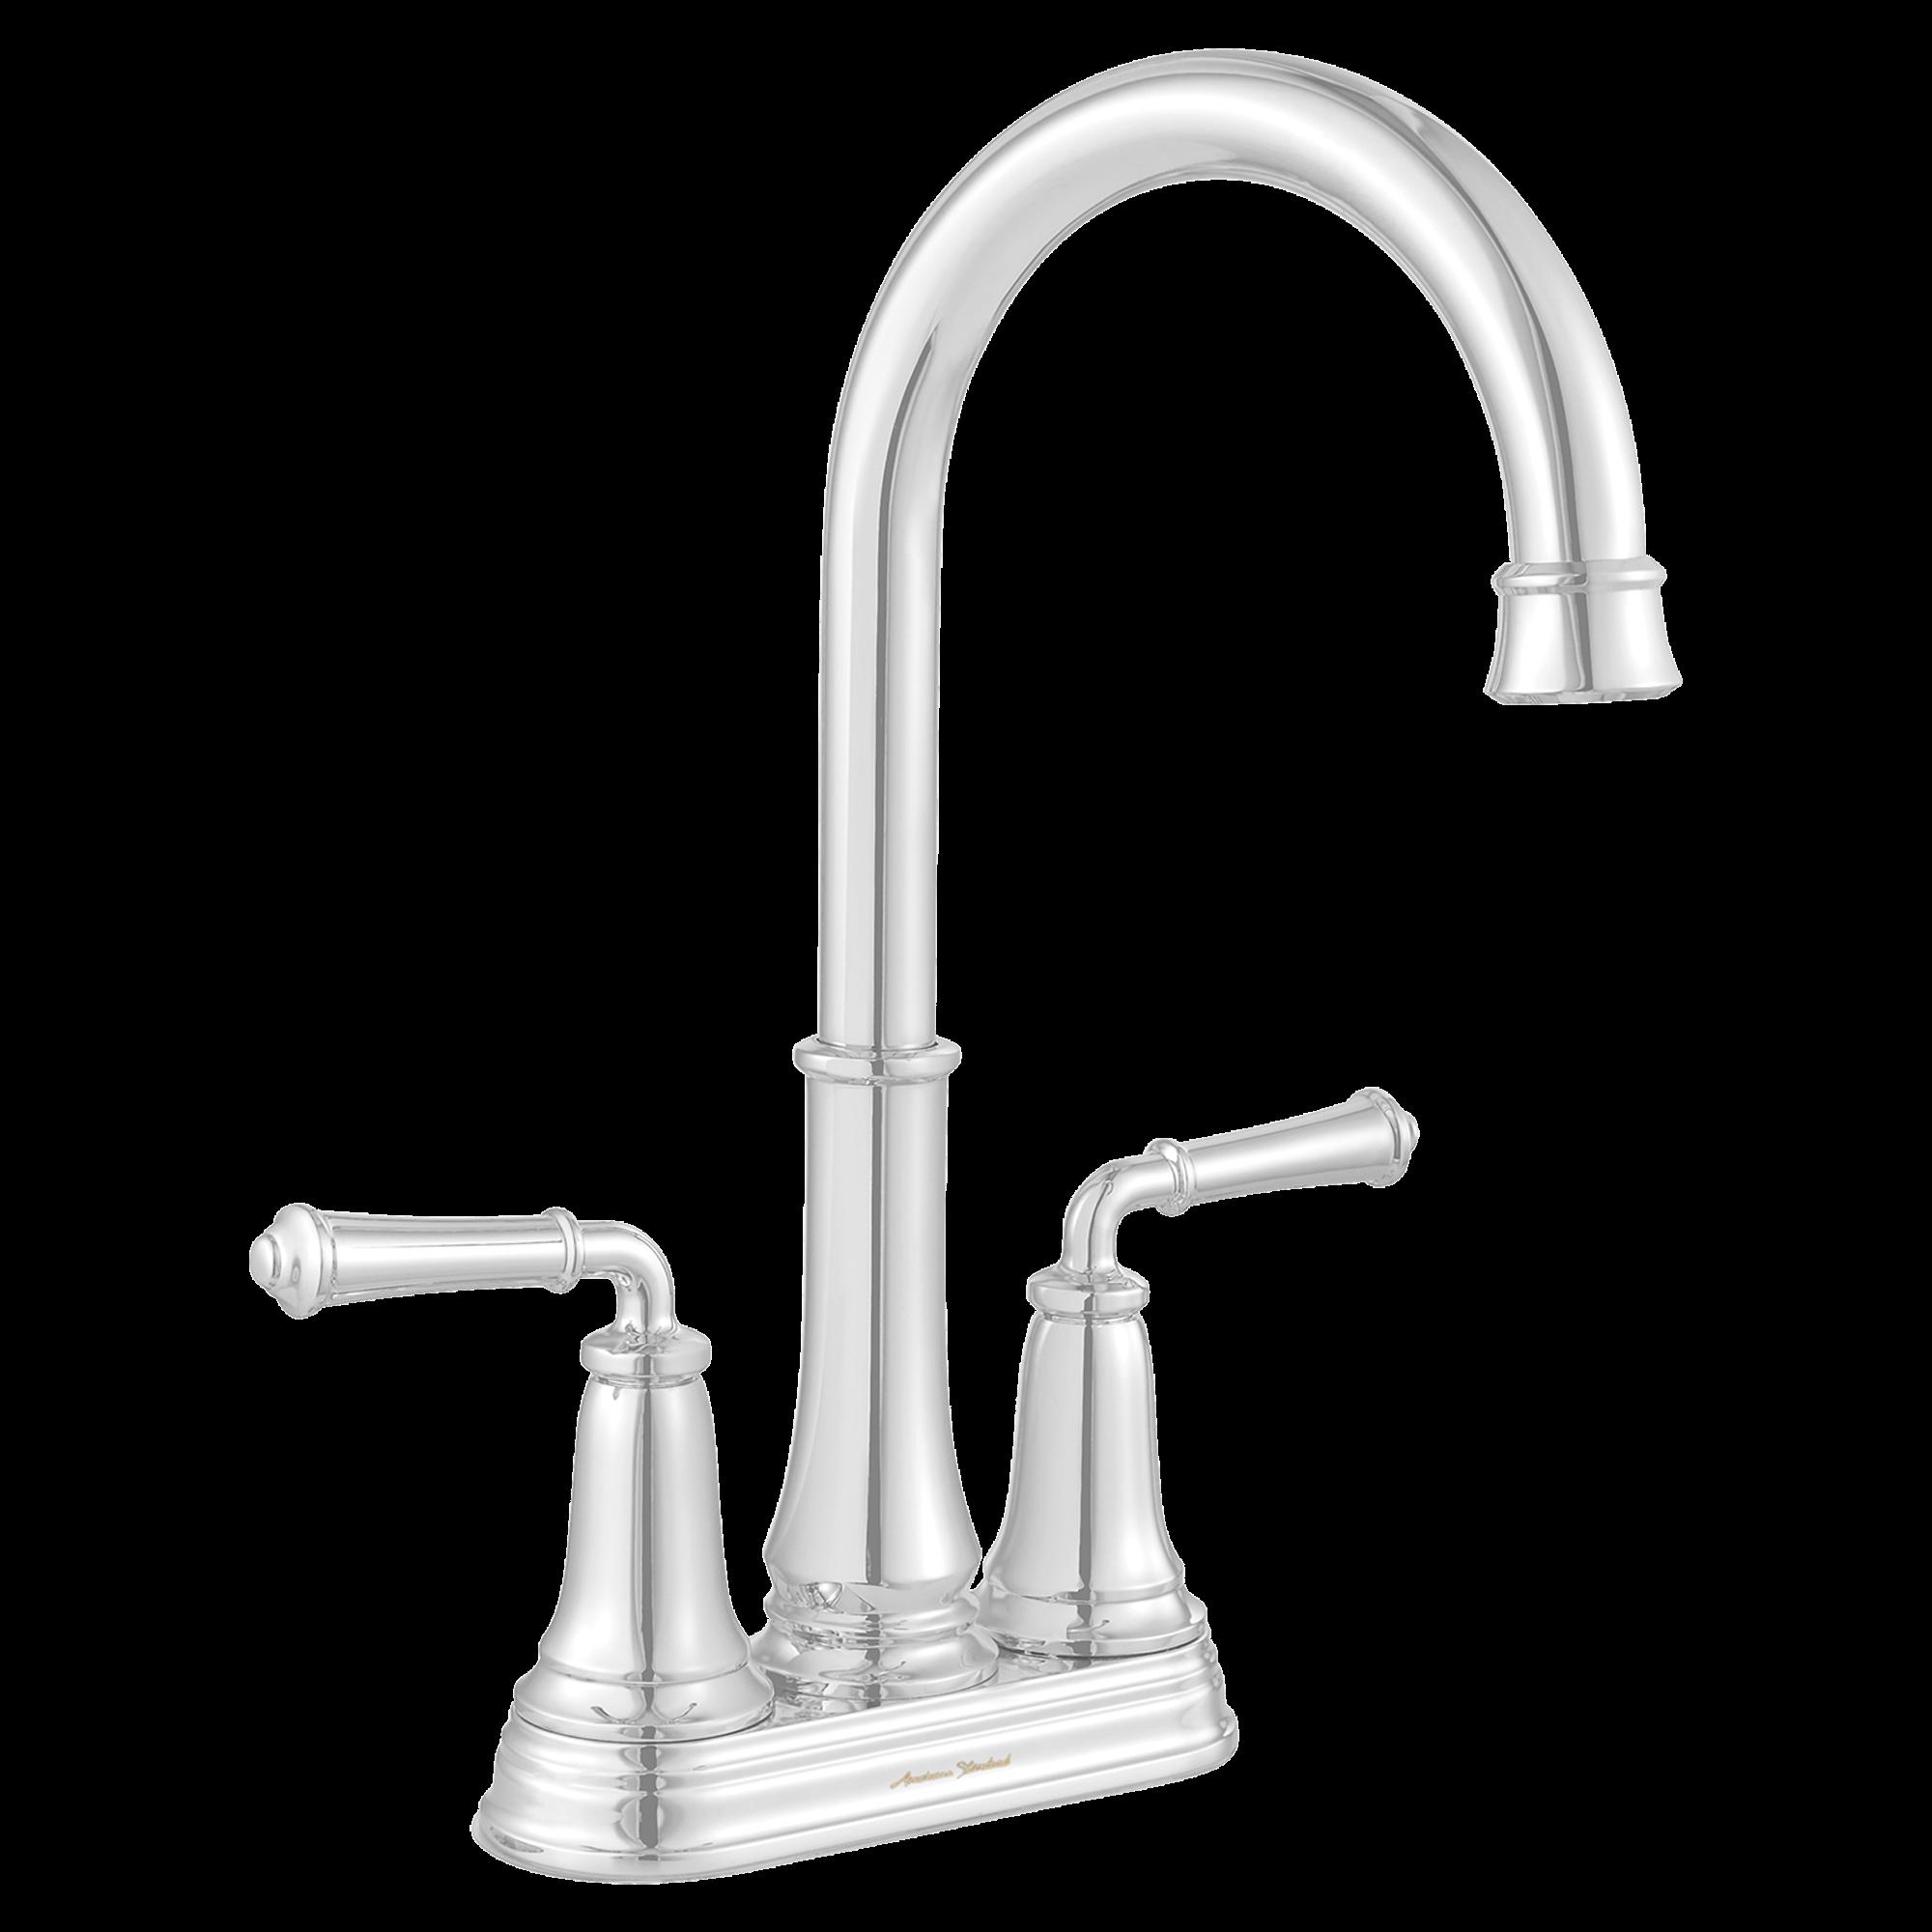 american standard silhouette kitchen sink home depot sinks undermount delancey centerset bar faucet